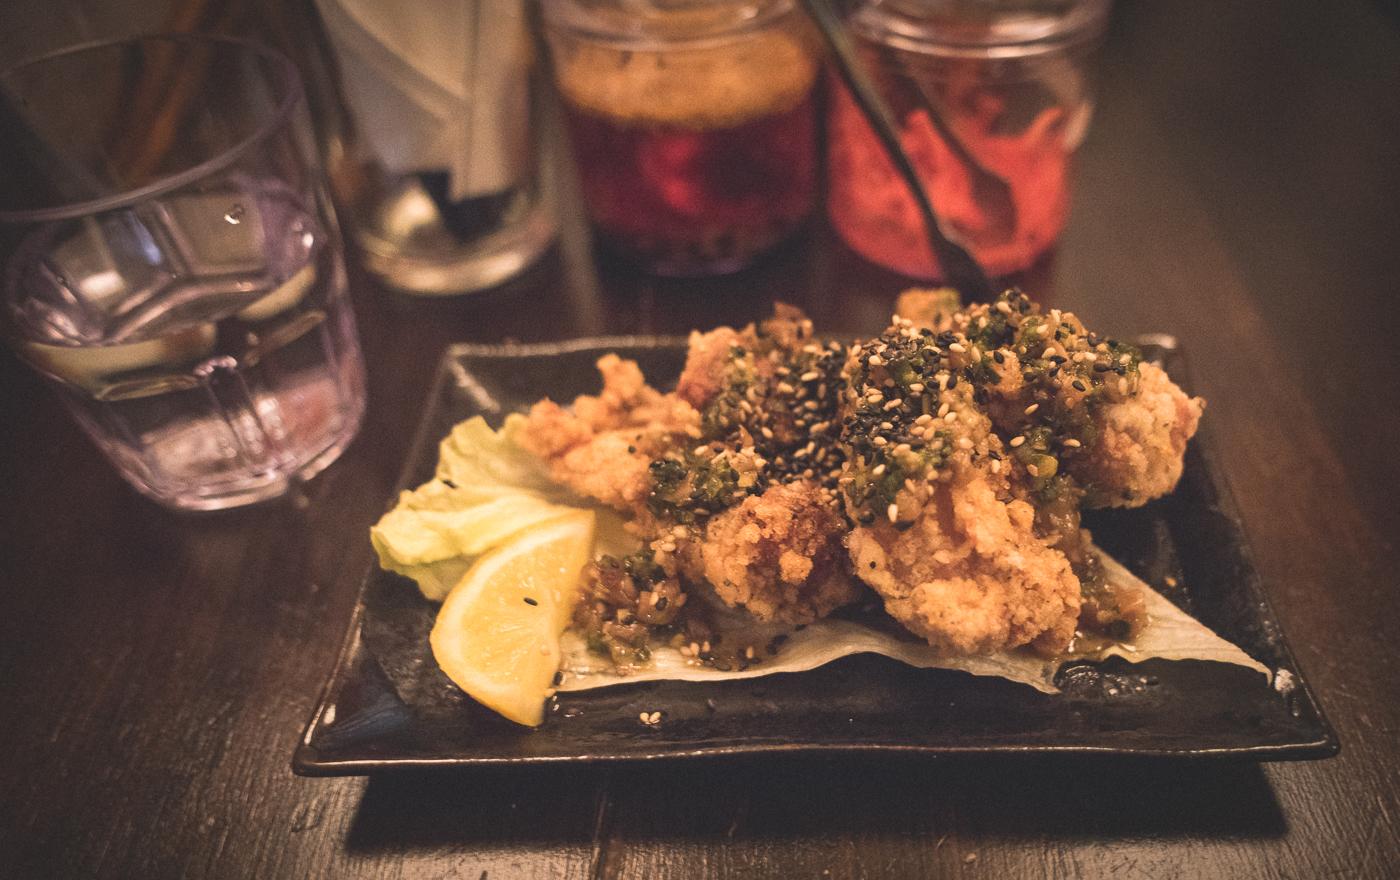 Yokato Yokabai - Japonais - Karaage - Poulet frit